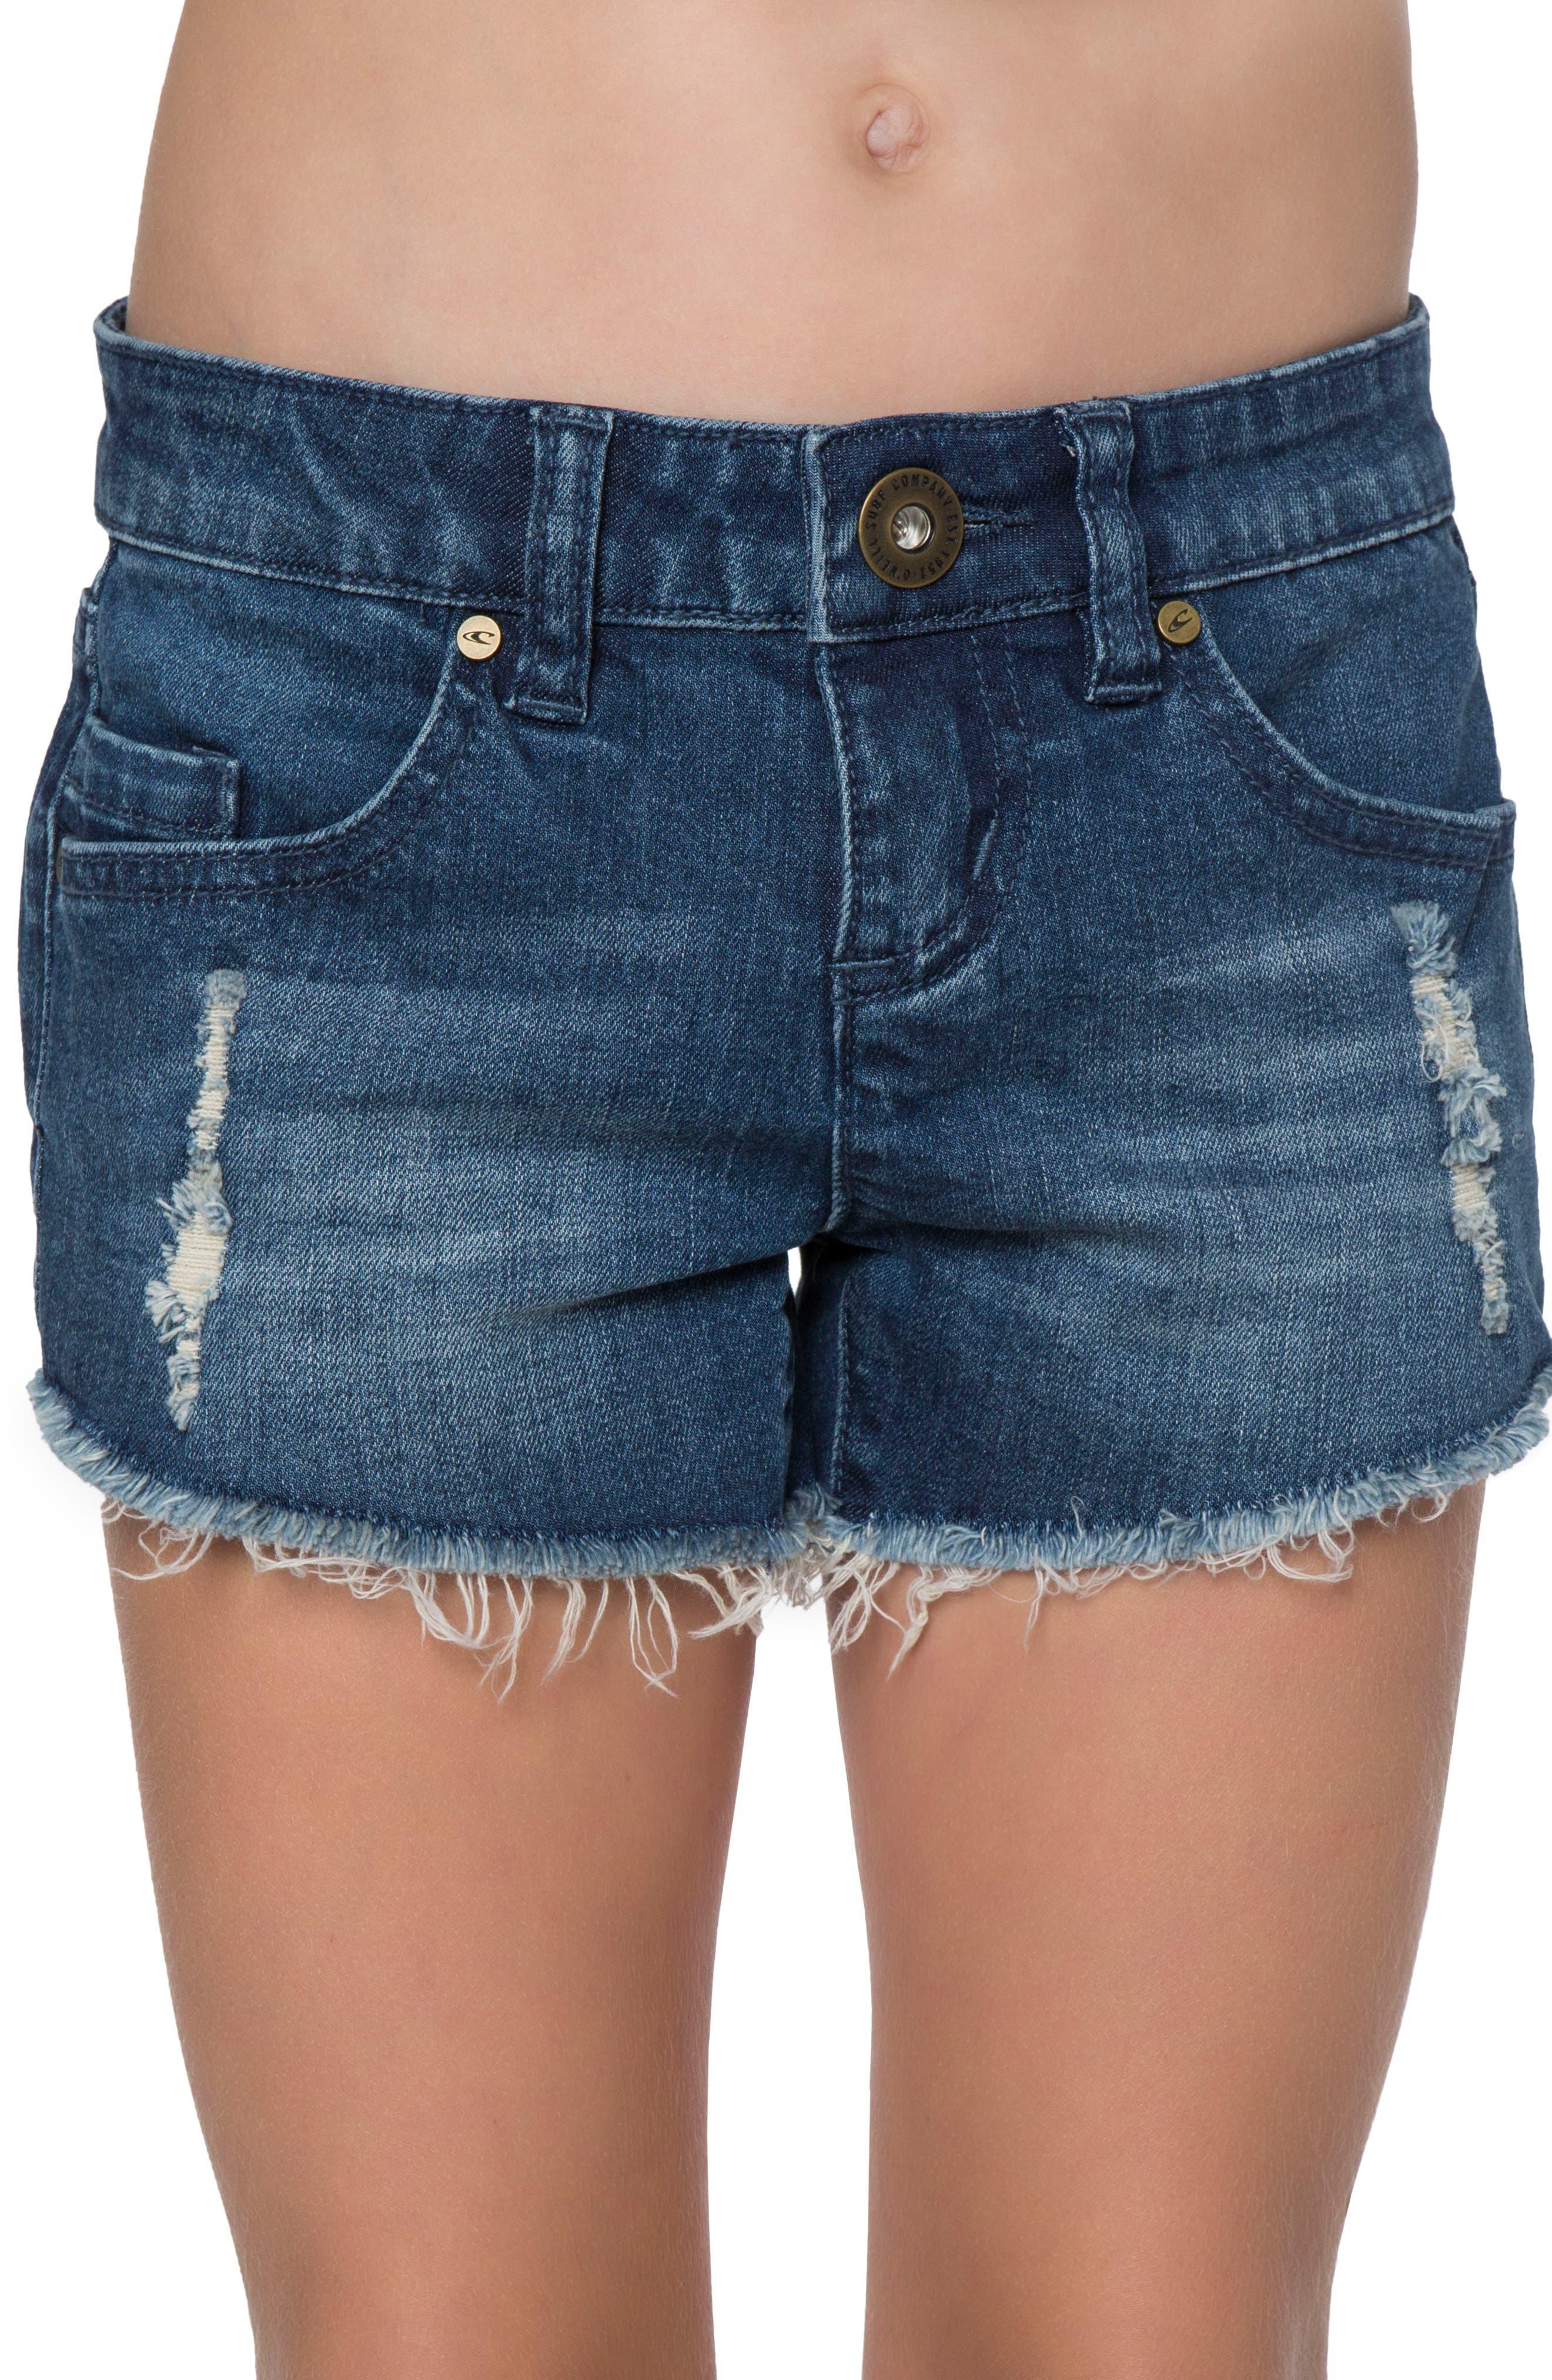 Camper Denim Shorts,                             Main thumbnail 1, color,                             Dutch Blue